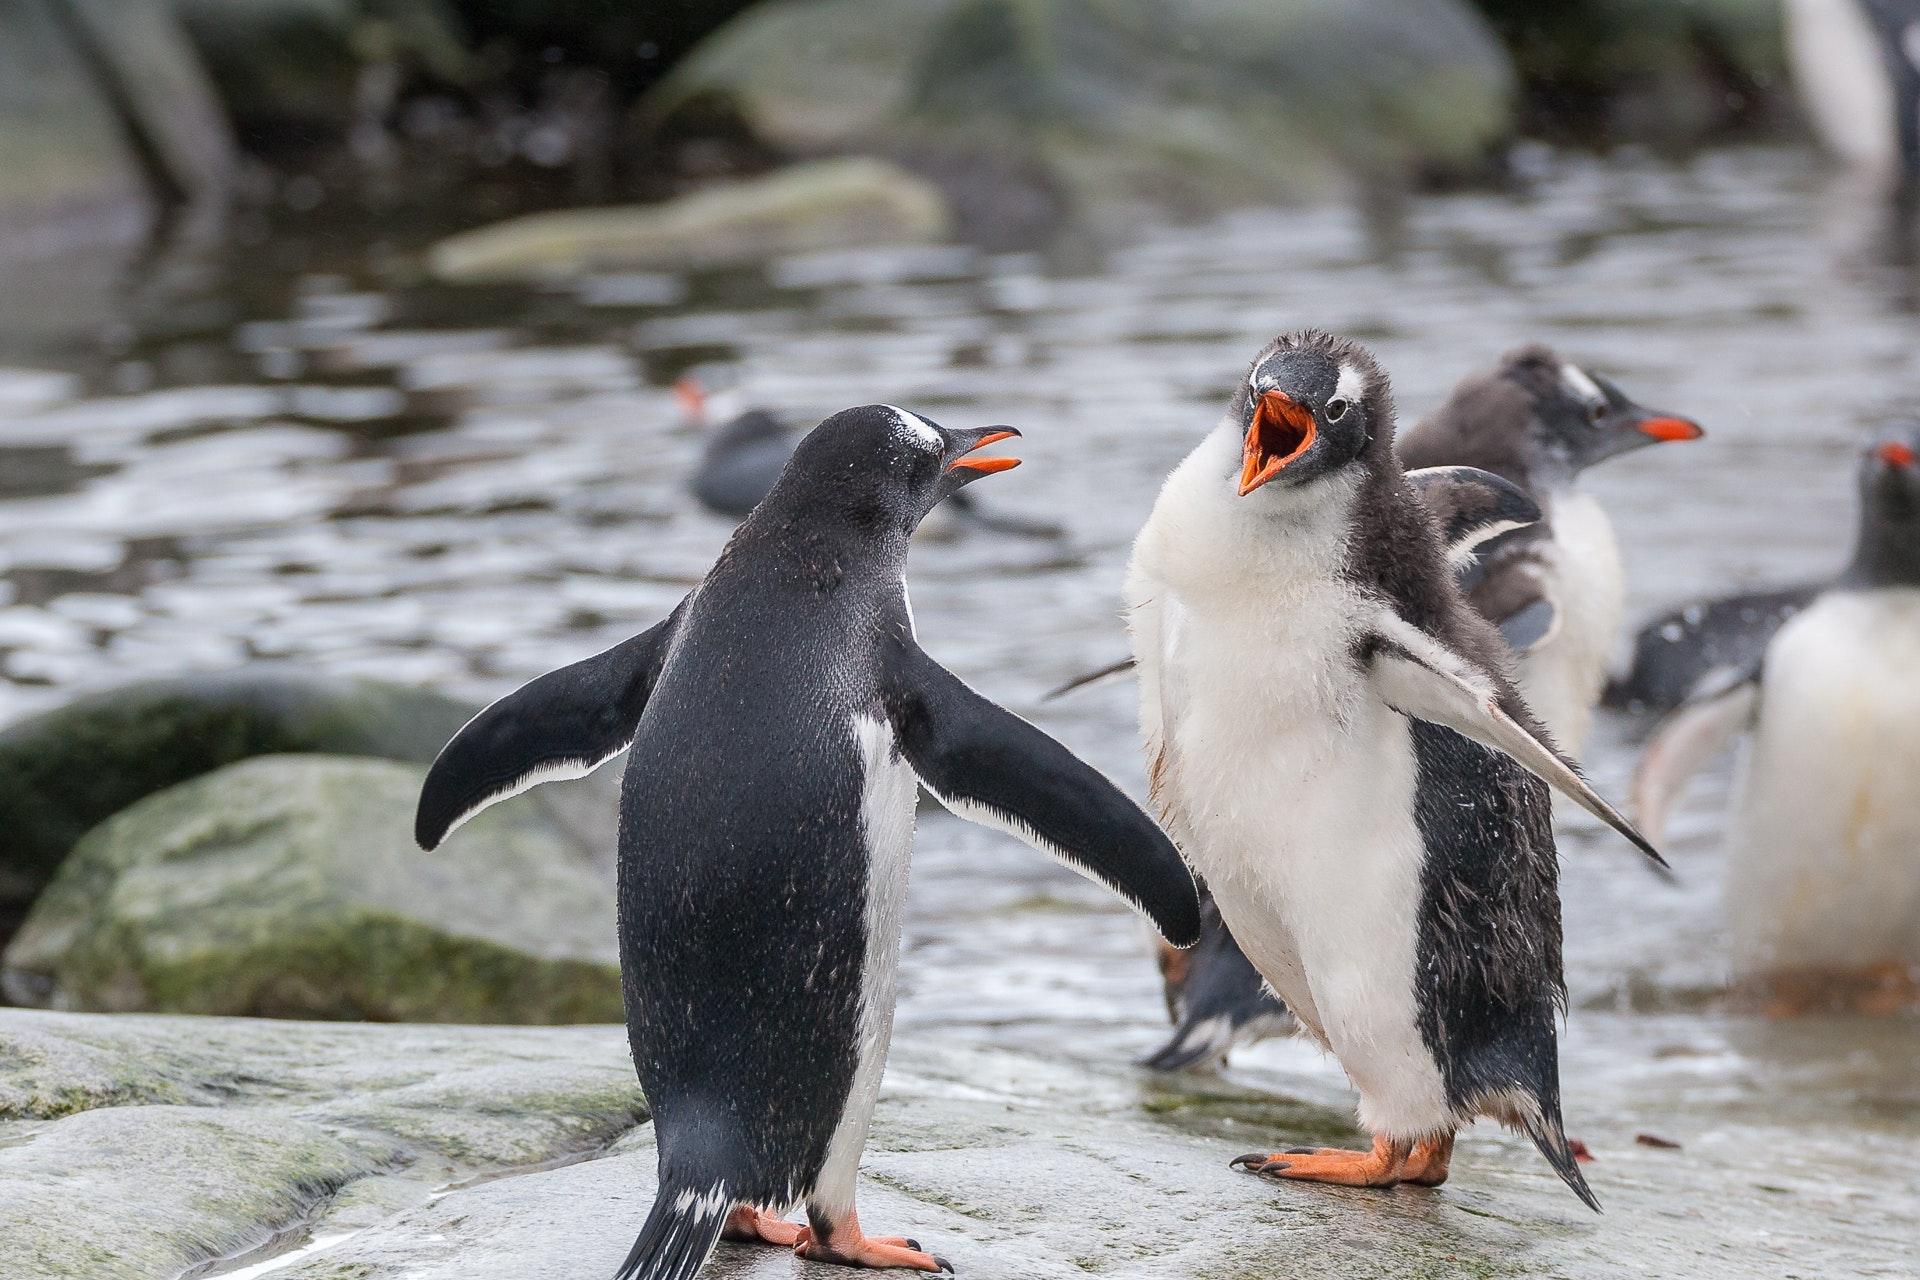 Screaming Gentoo Penguins